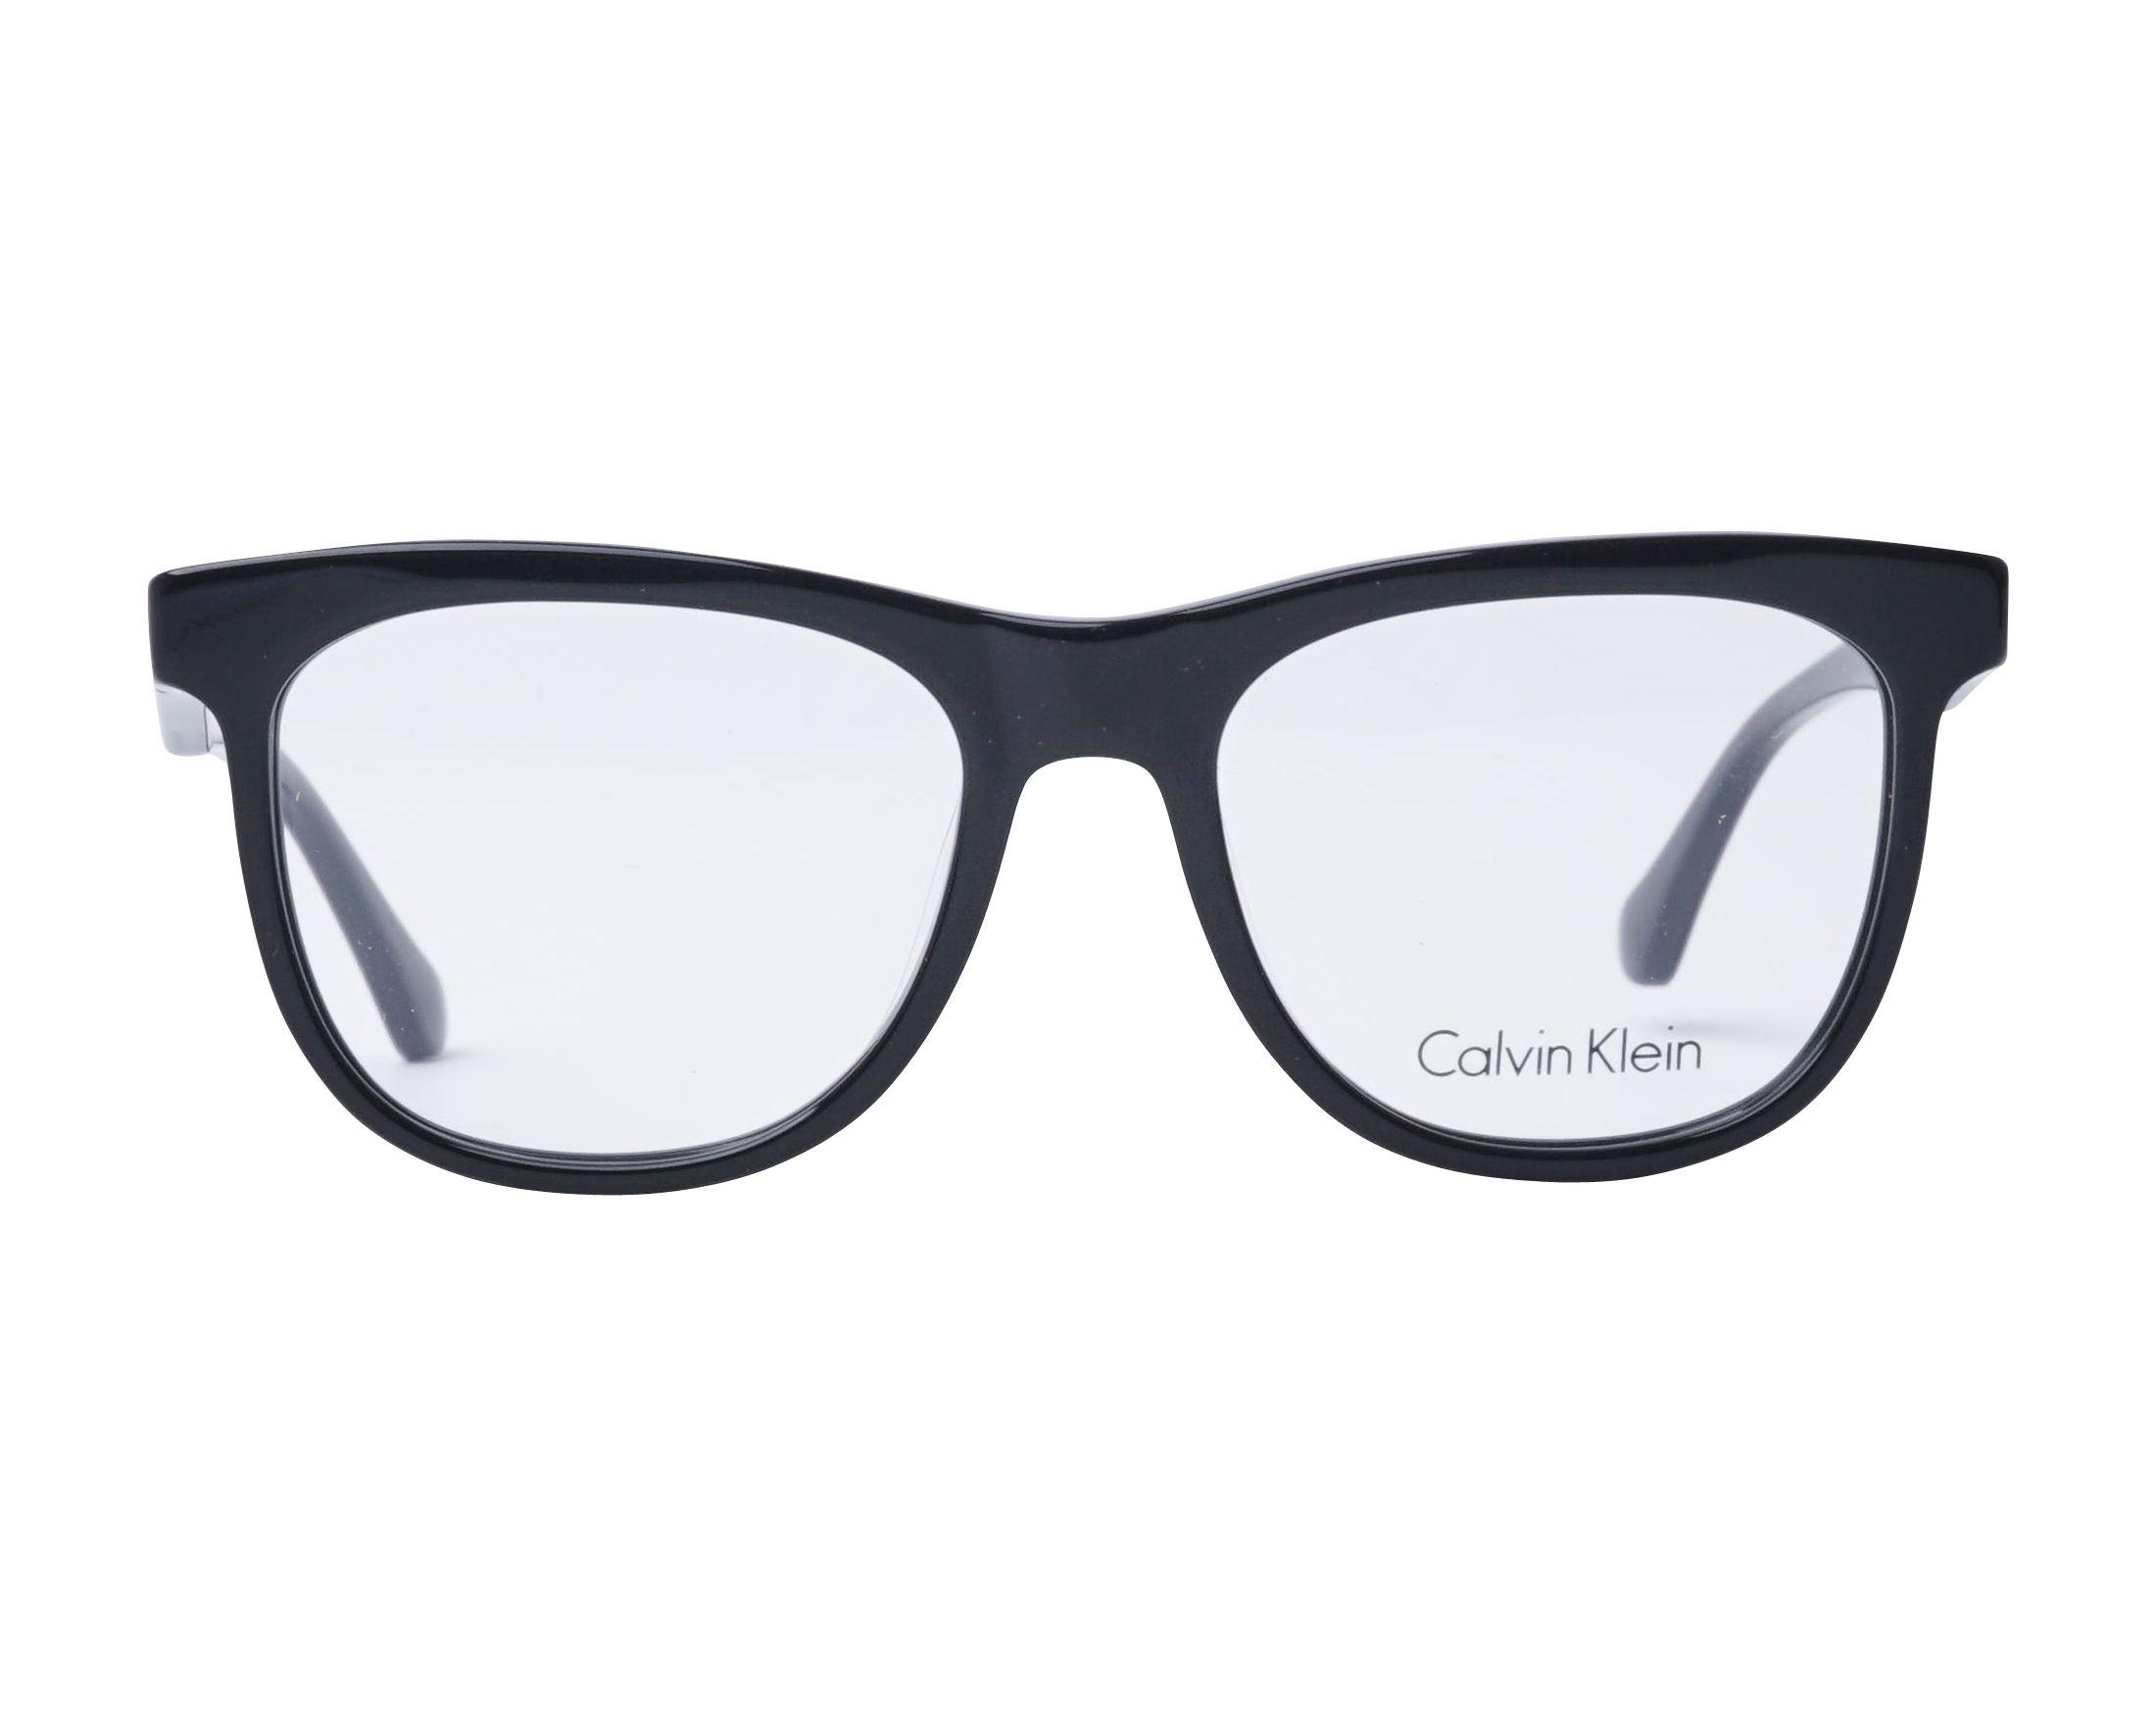 calvin klein brille ck 5922 001 schwarz visionet. Black Bedroom Furniture Sets. Home Design Ideas